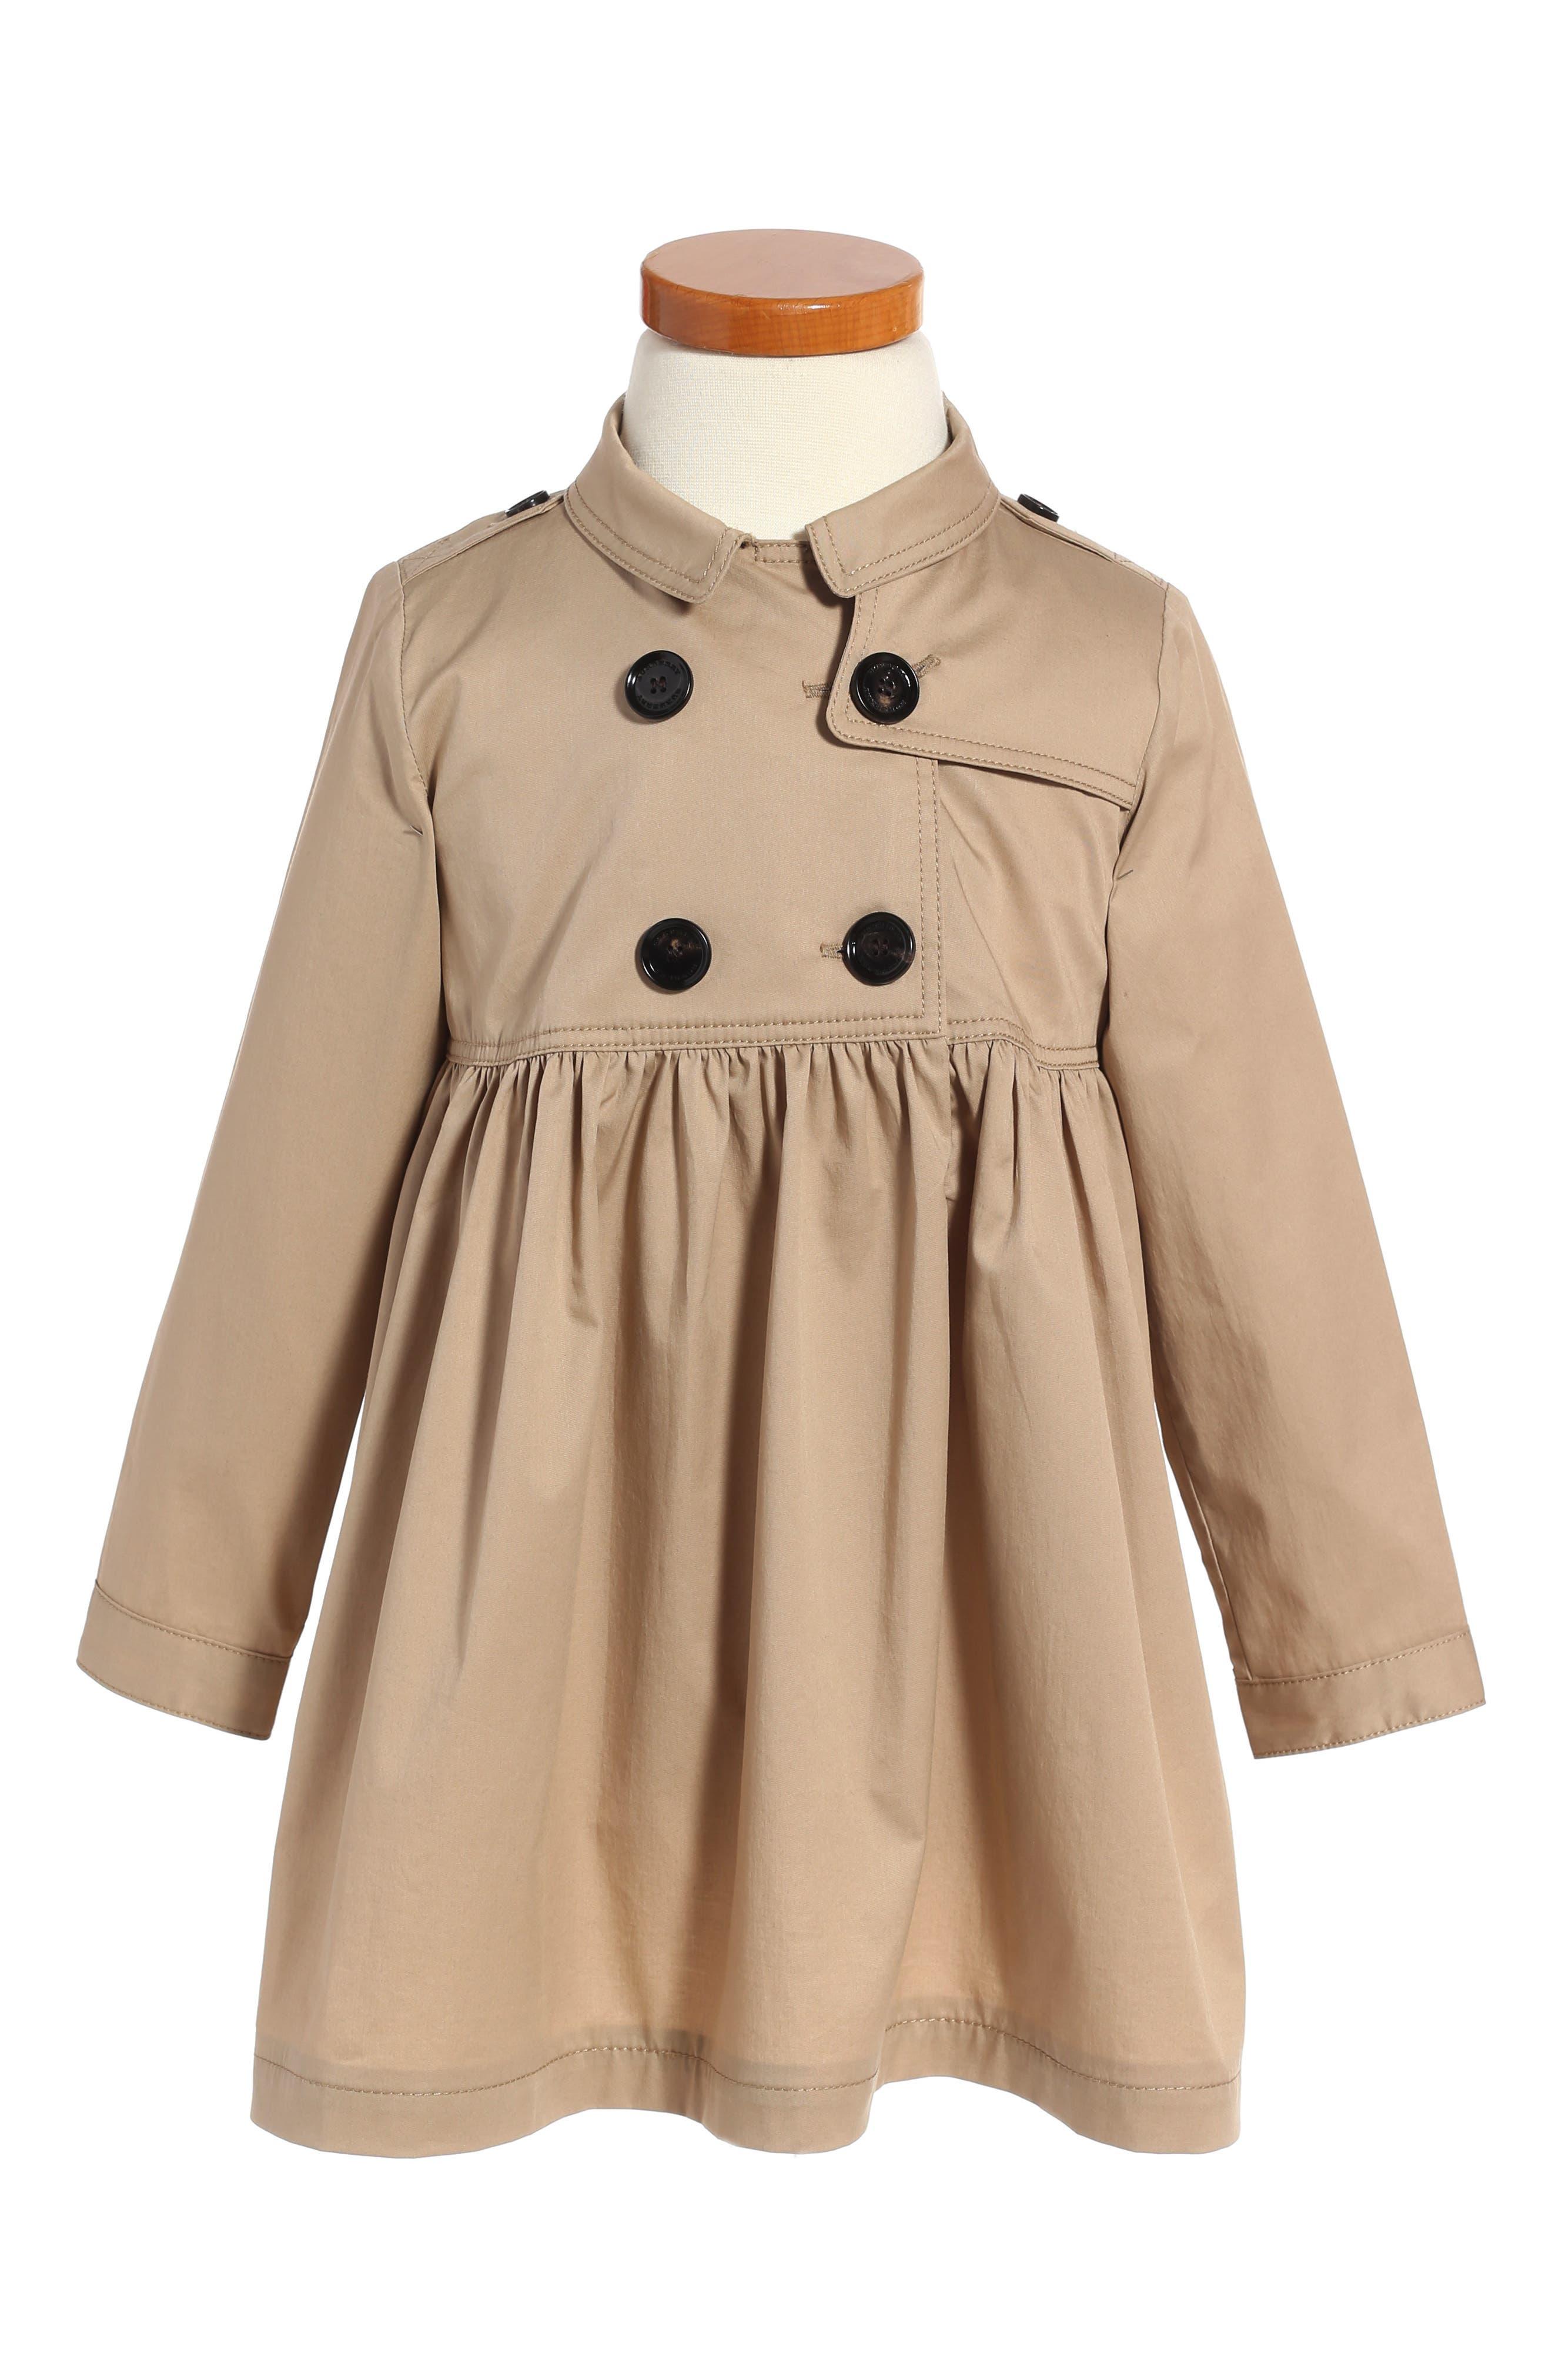 Burberry Lillybeth Dress (Toddler Girls)